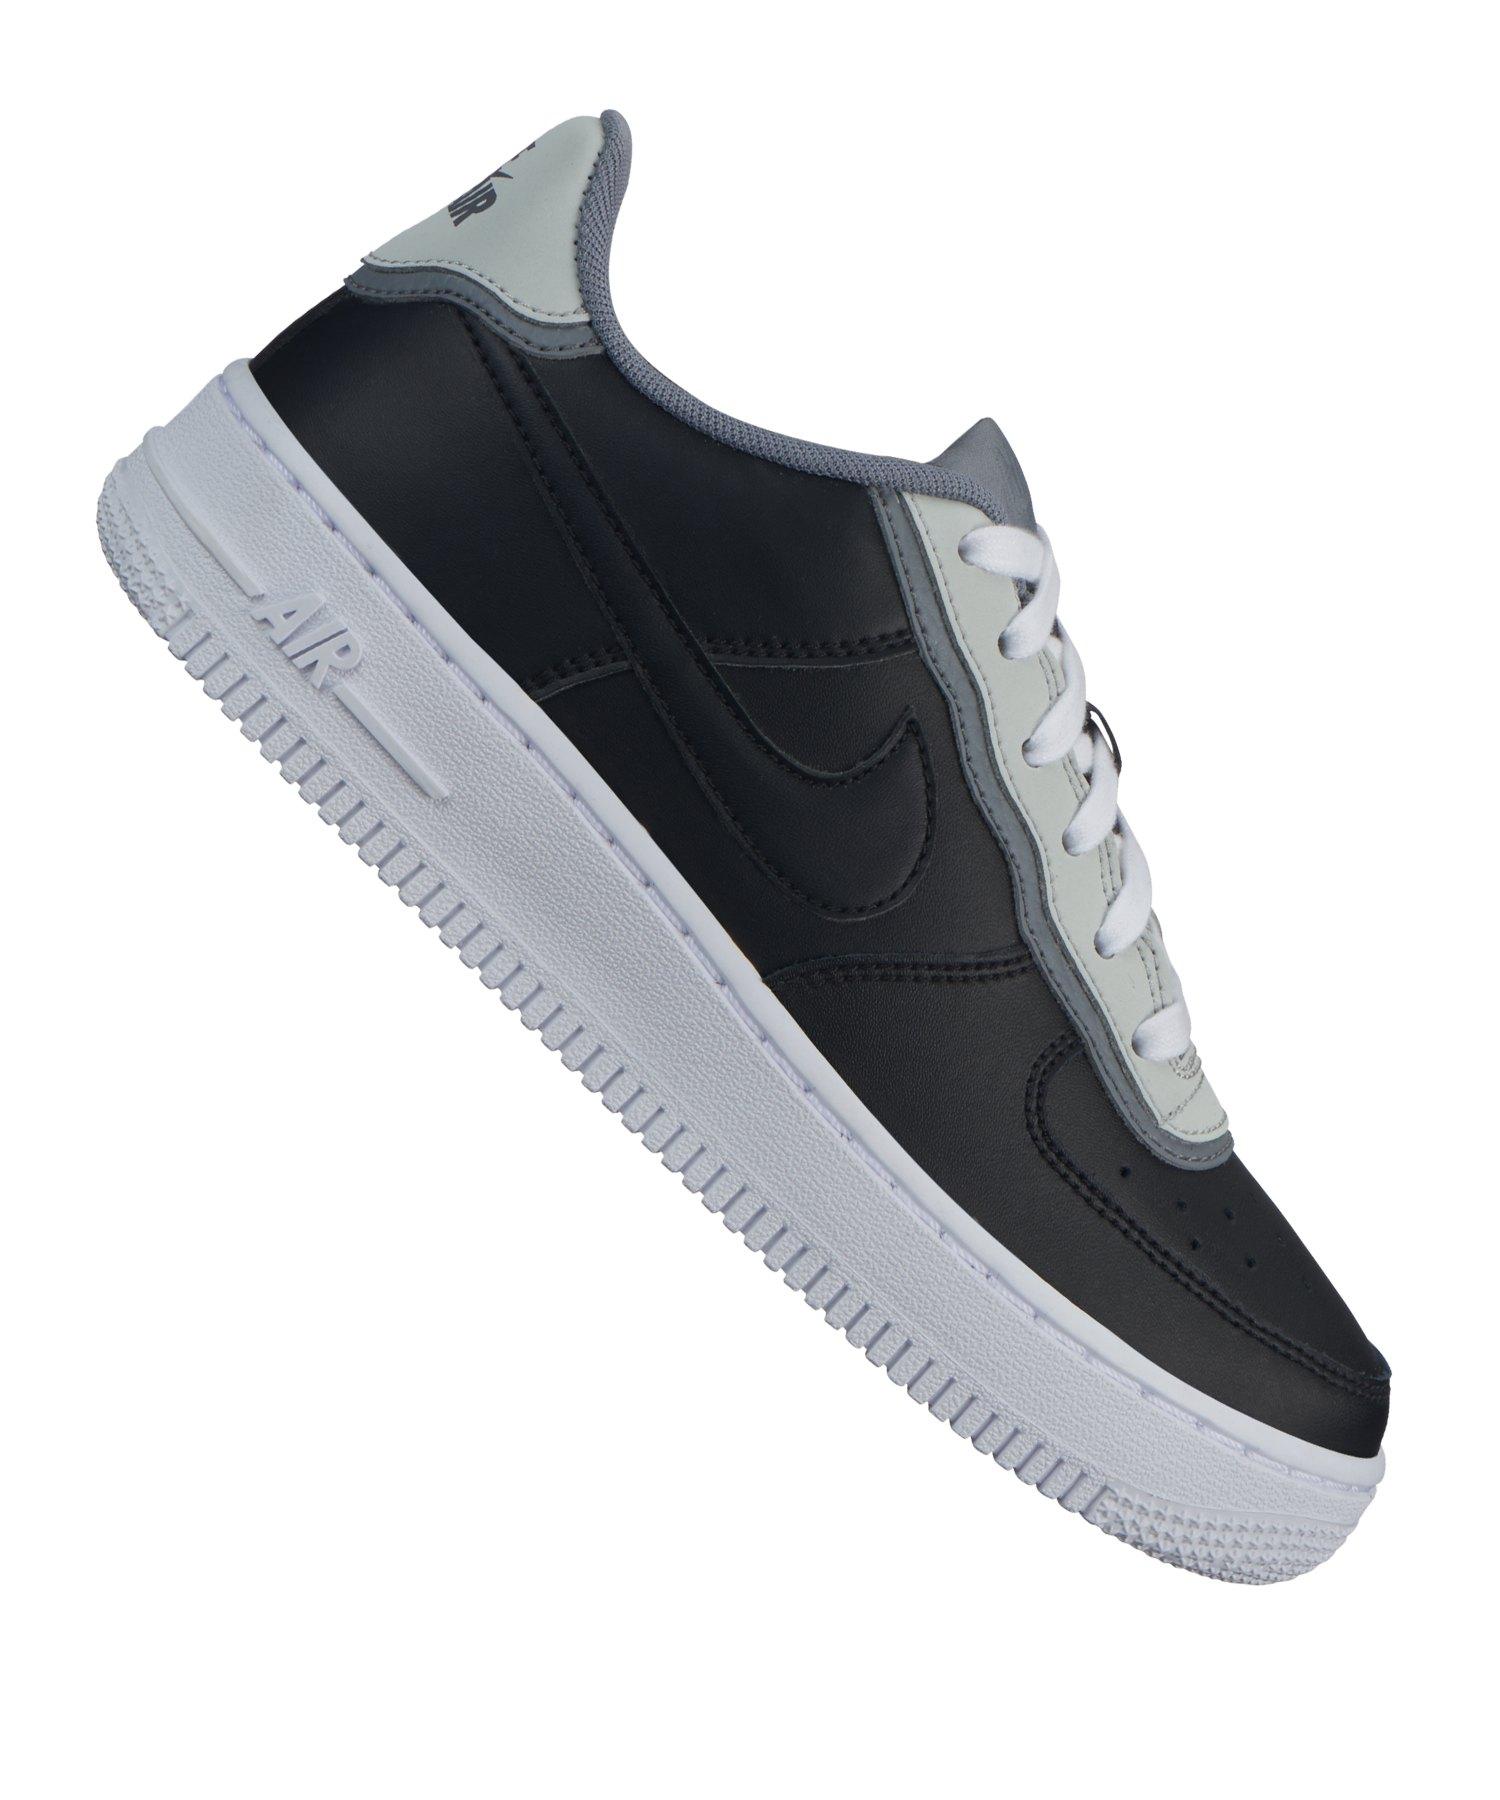 Nike Air Force Kinder schwarz weis 36,5